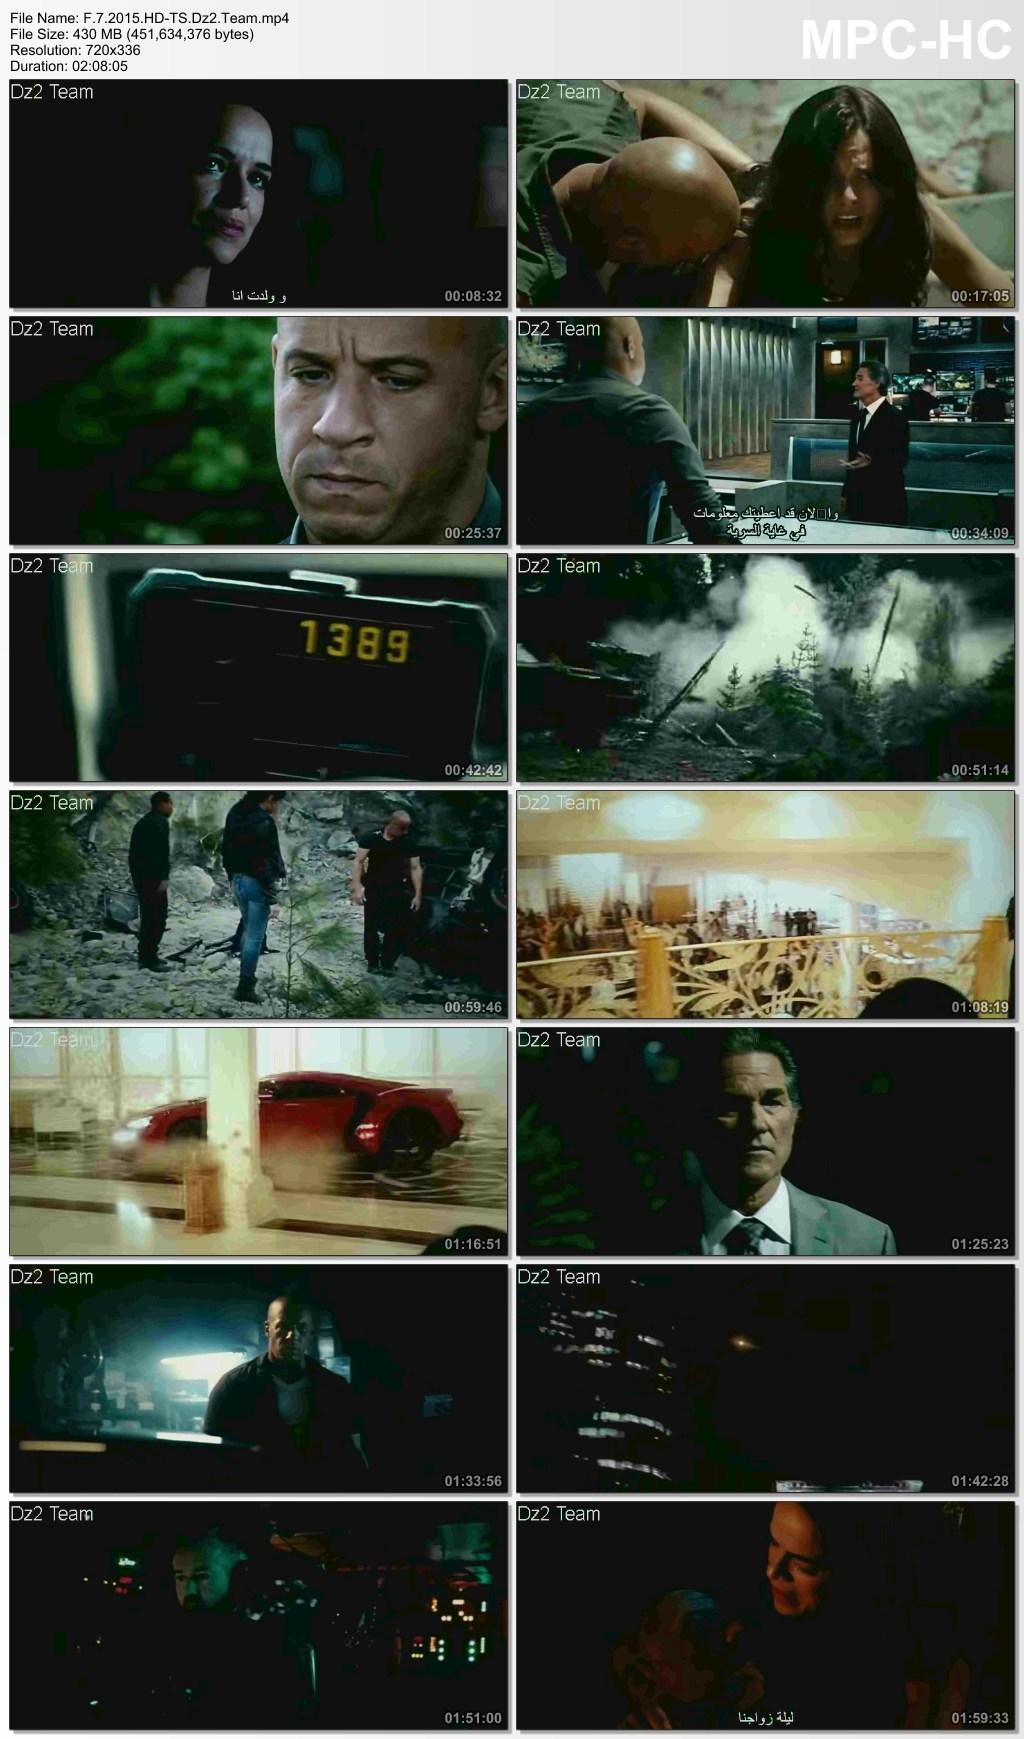 فيلم الاكشن Fast and Furious 7 2015 HD-TS.x265 مترجم بحجم ...